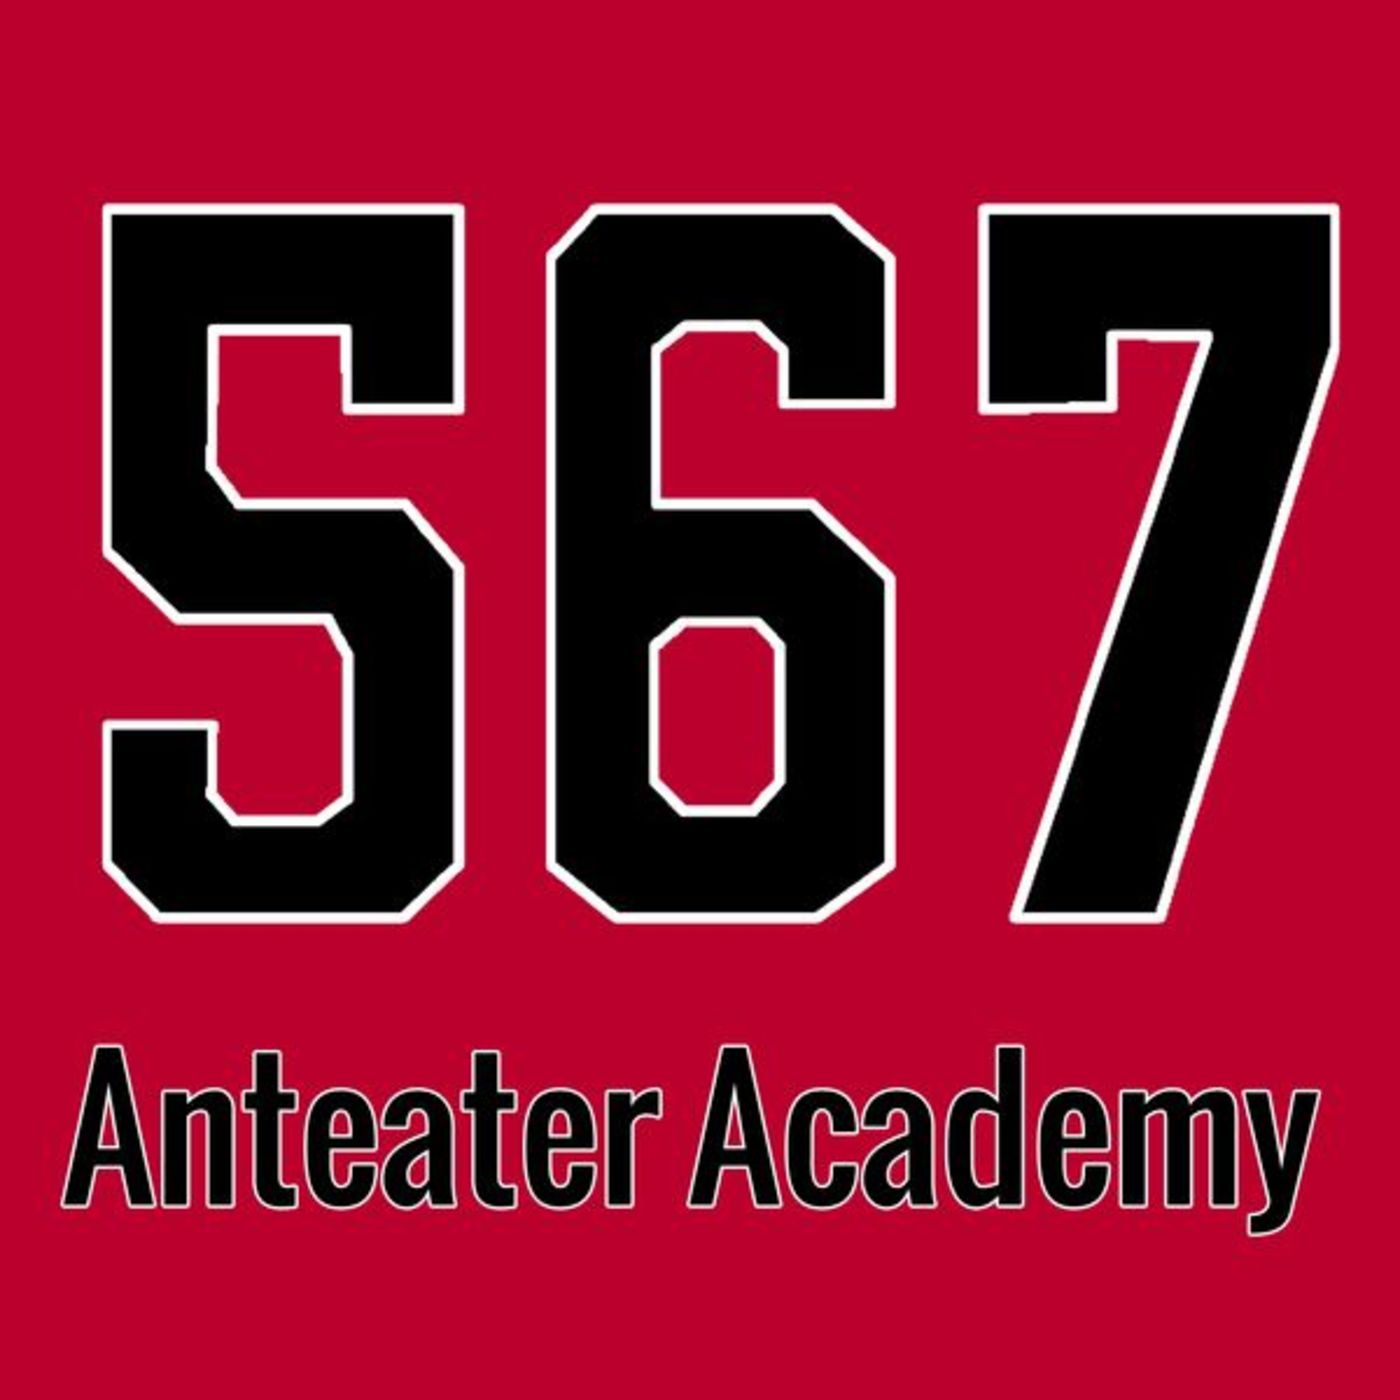 <![CDATA[Anteater Academy]]>